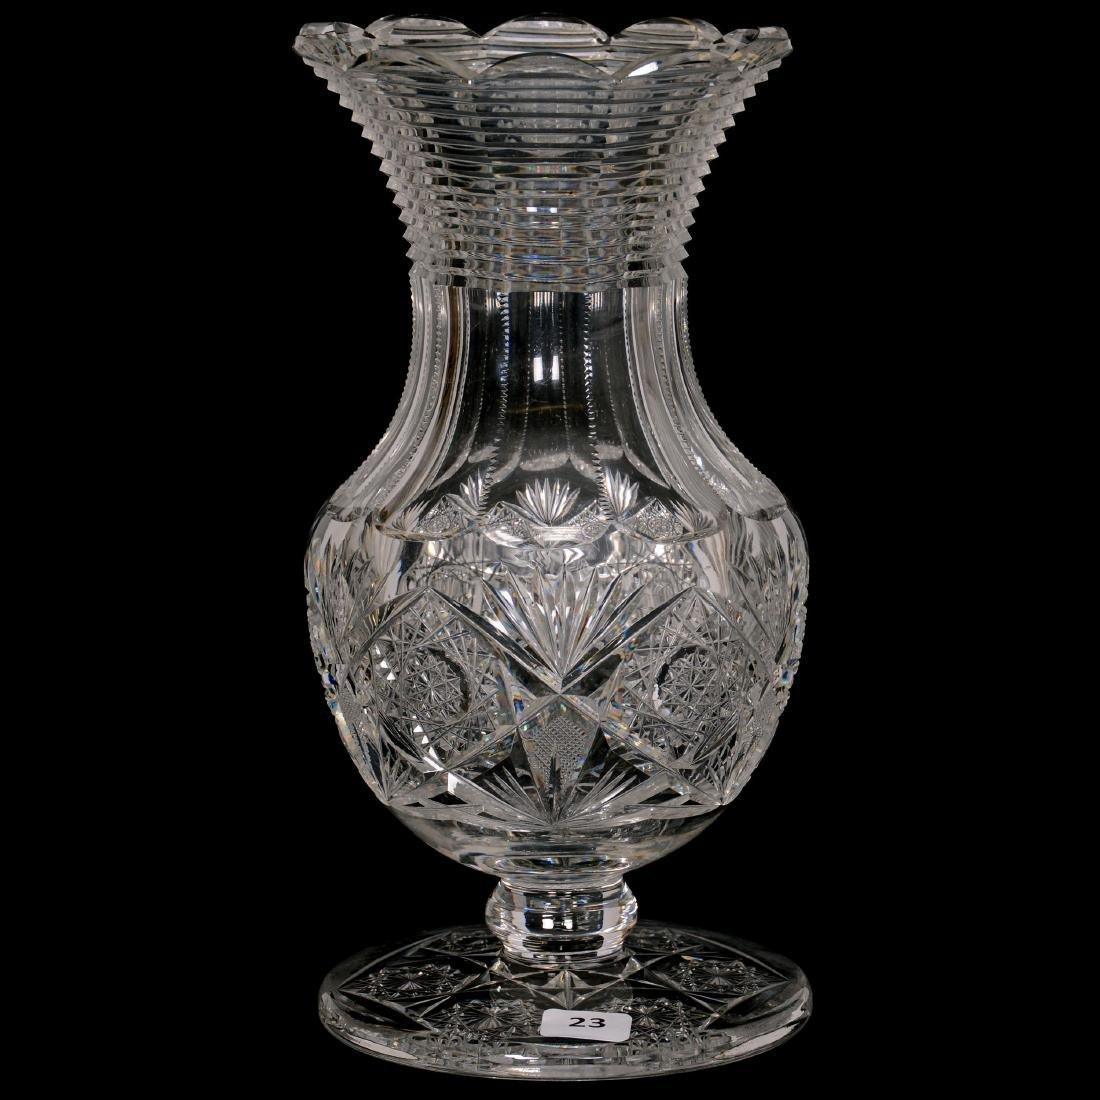 Pedestal Vase - ABCG